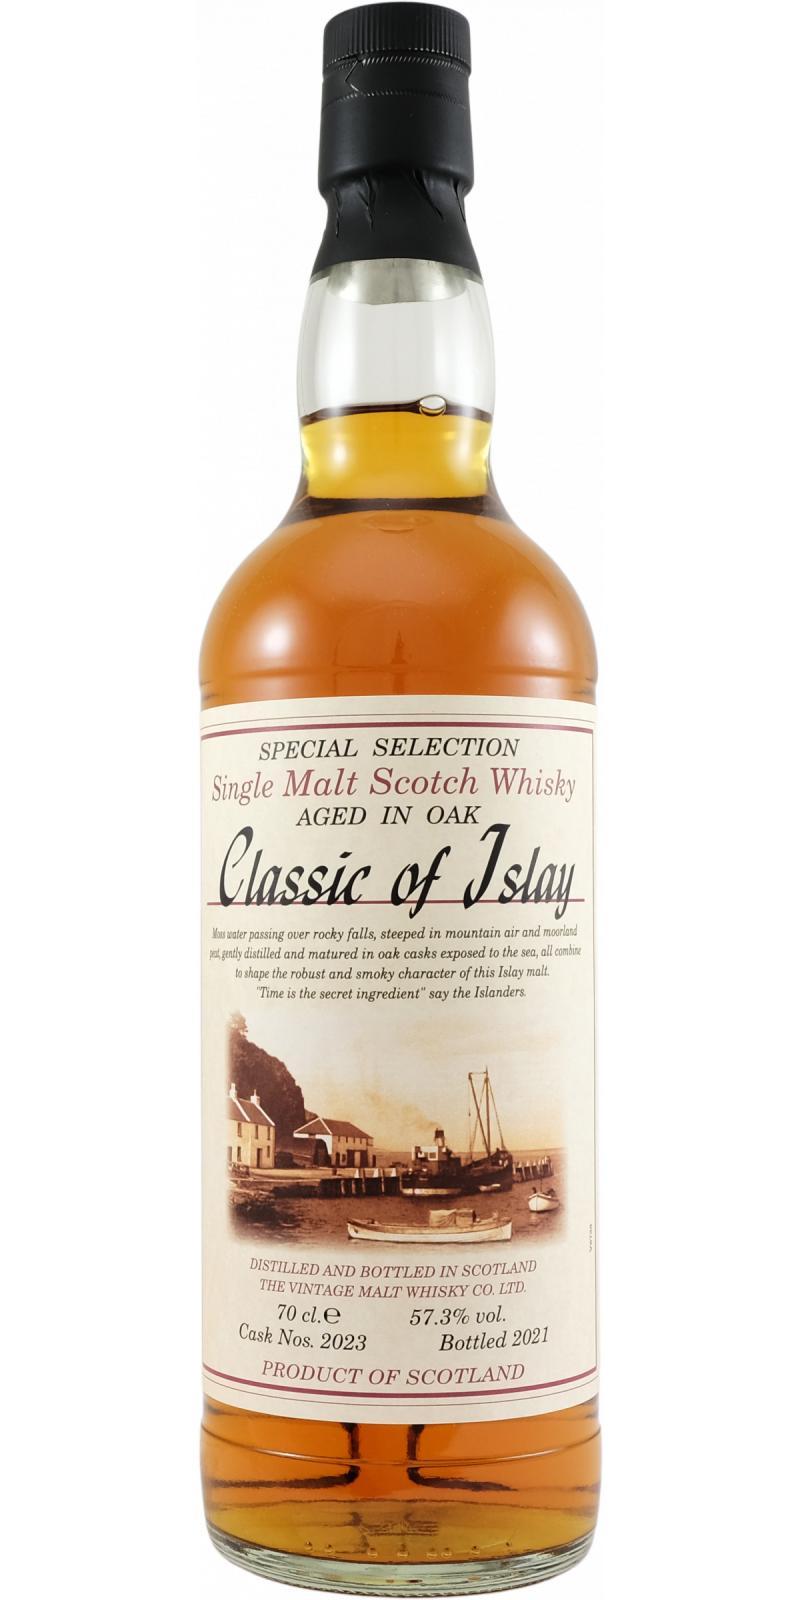 Classic of Islay Vintage 2021 JW